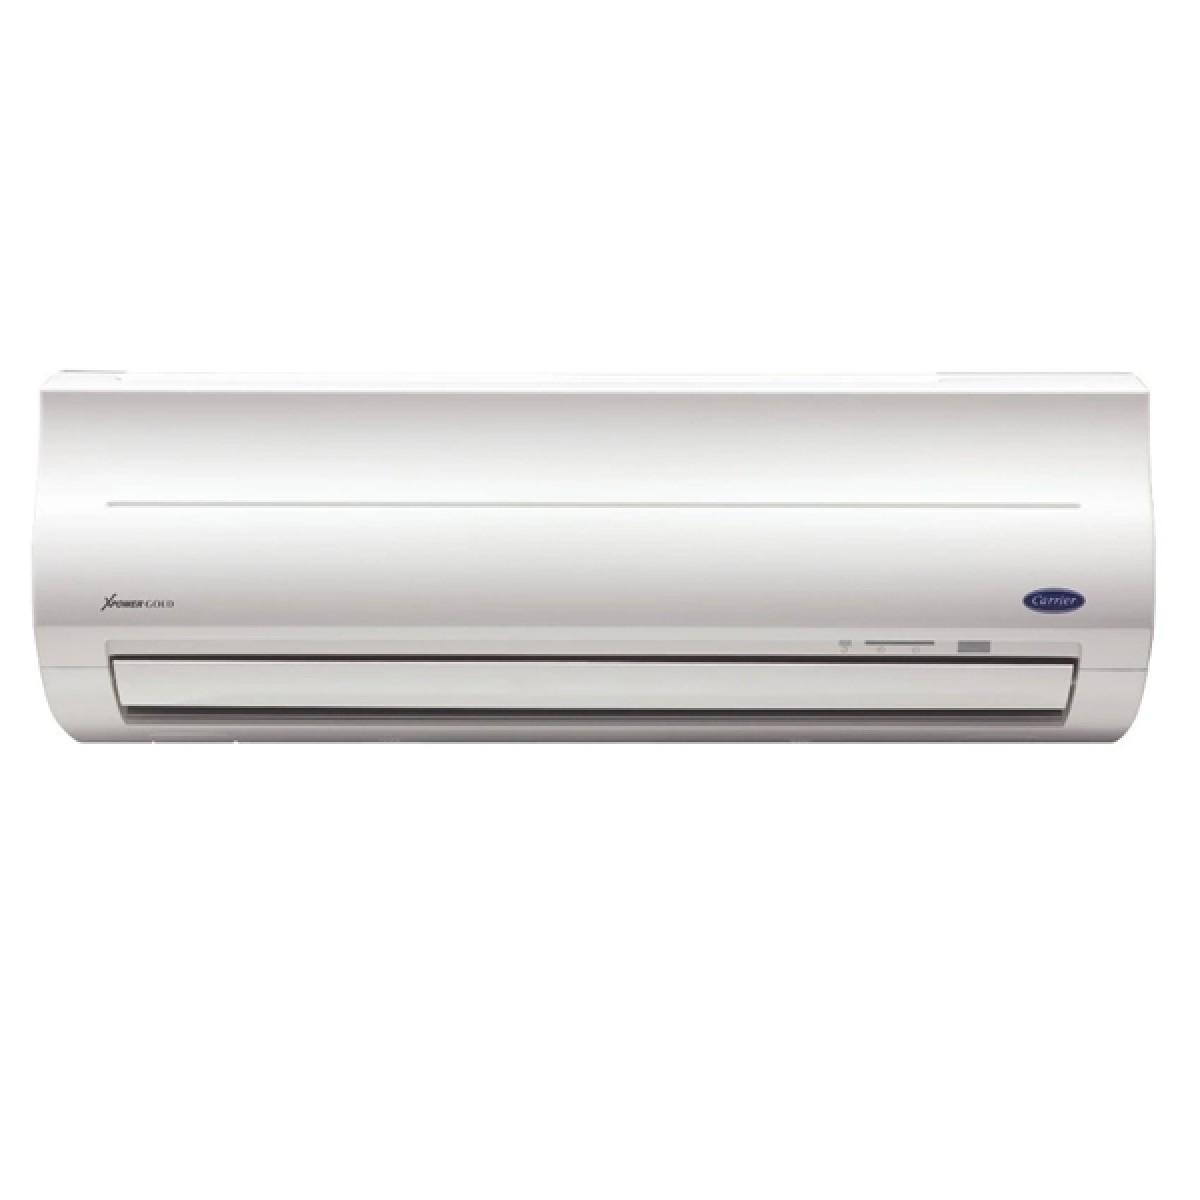 Carrier cvur016 inverter split type ac robinsons appliances for Split type ac